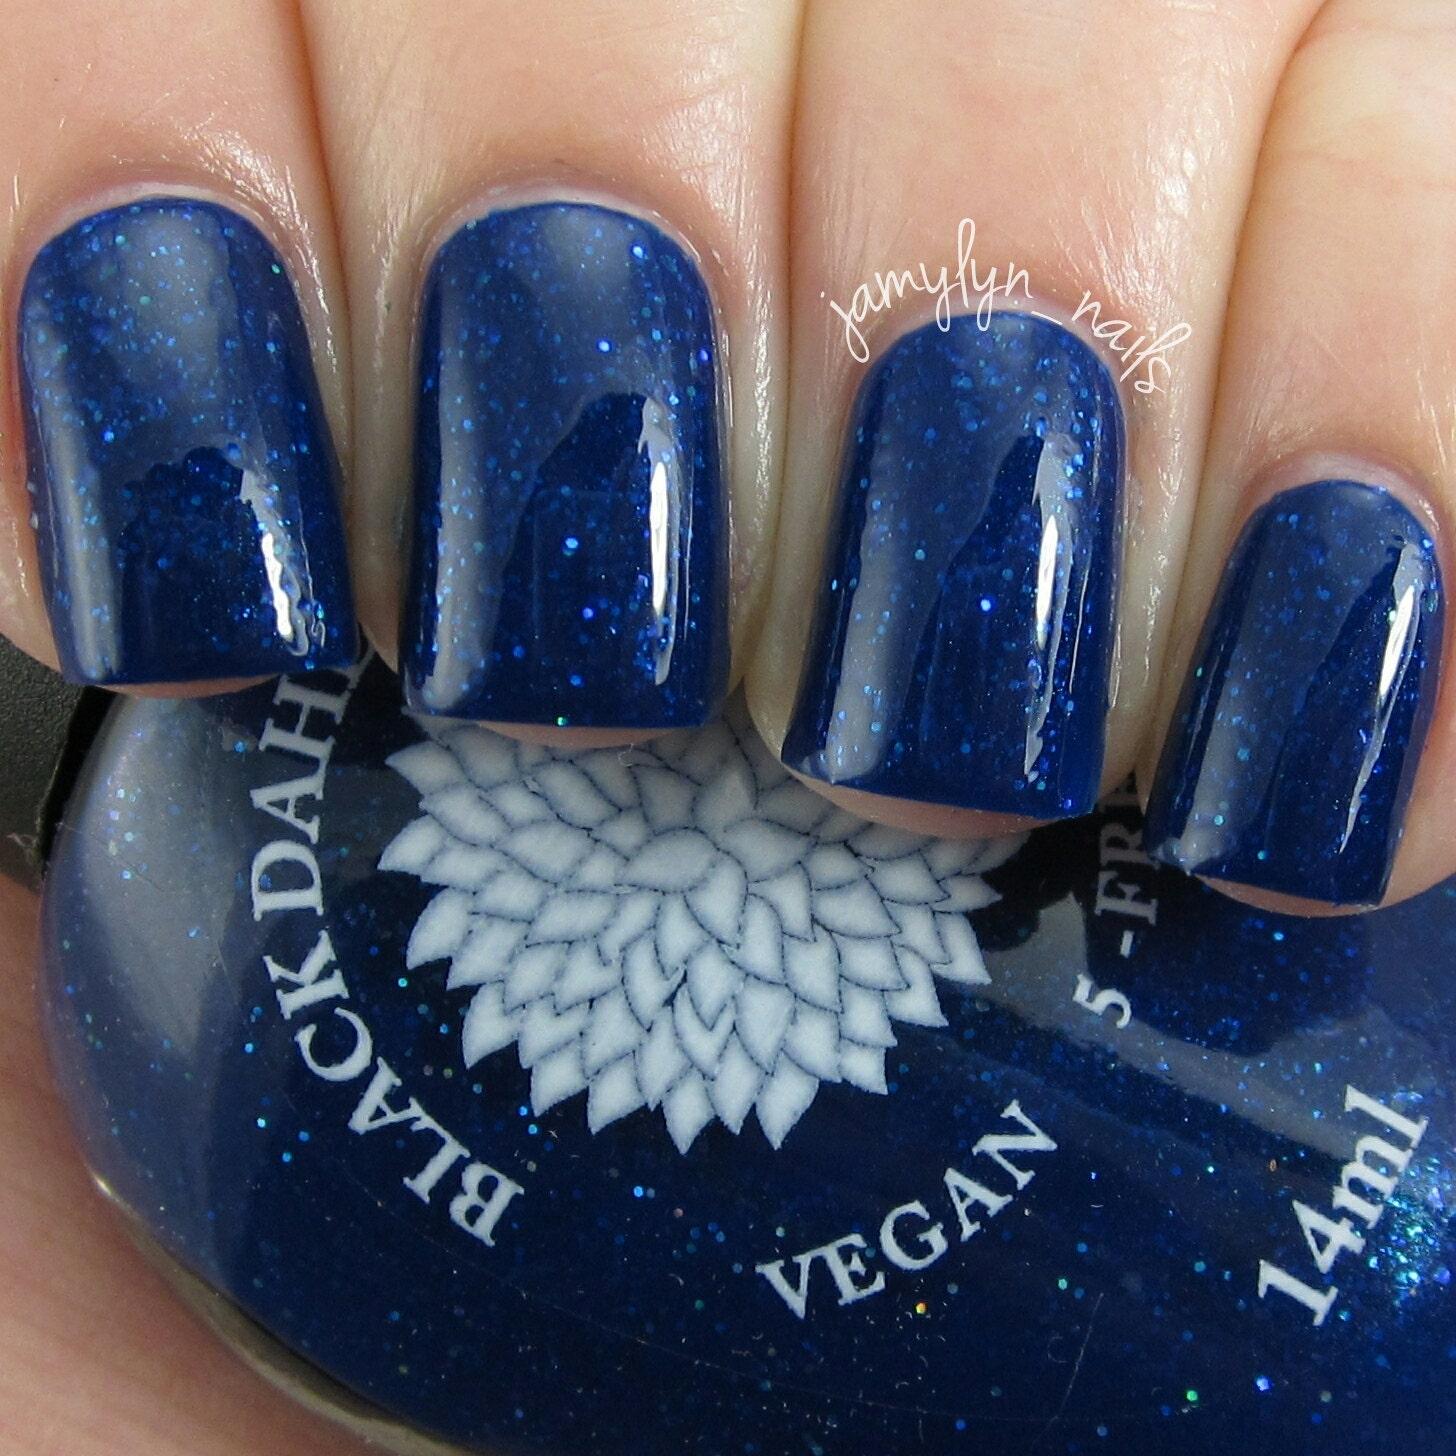 Black Nail Polish What Does It Mean: Brilliant Dark Blue Nail Polish With Glitter Anf Flakes